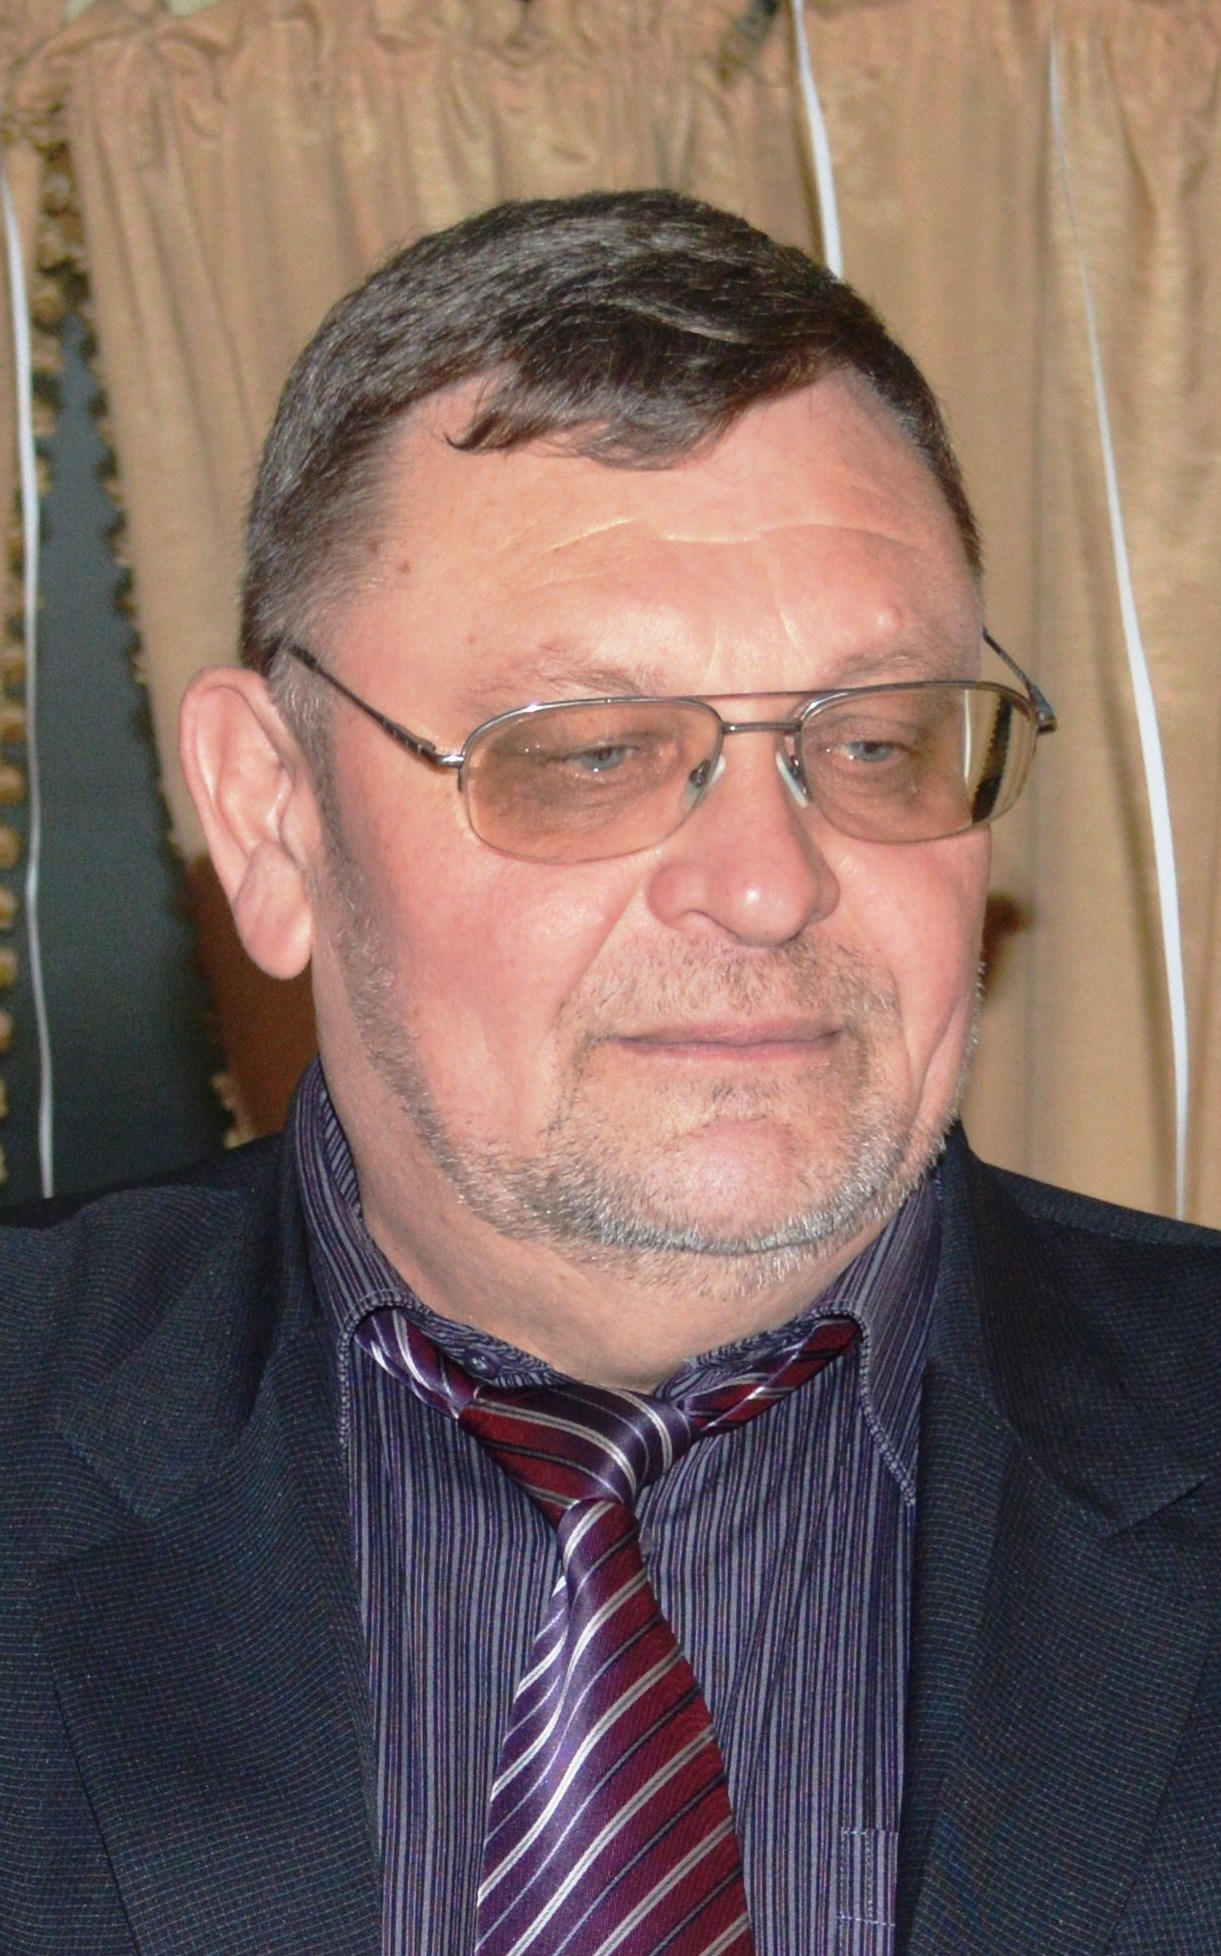 Сорокин В.В.